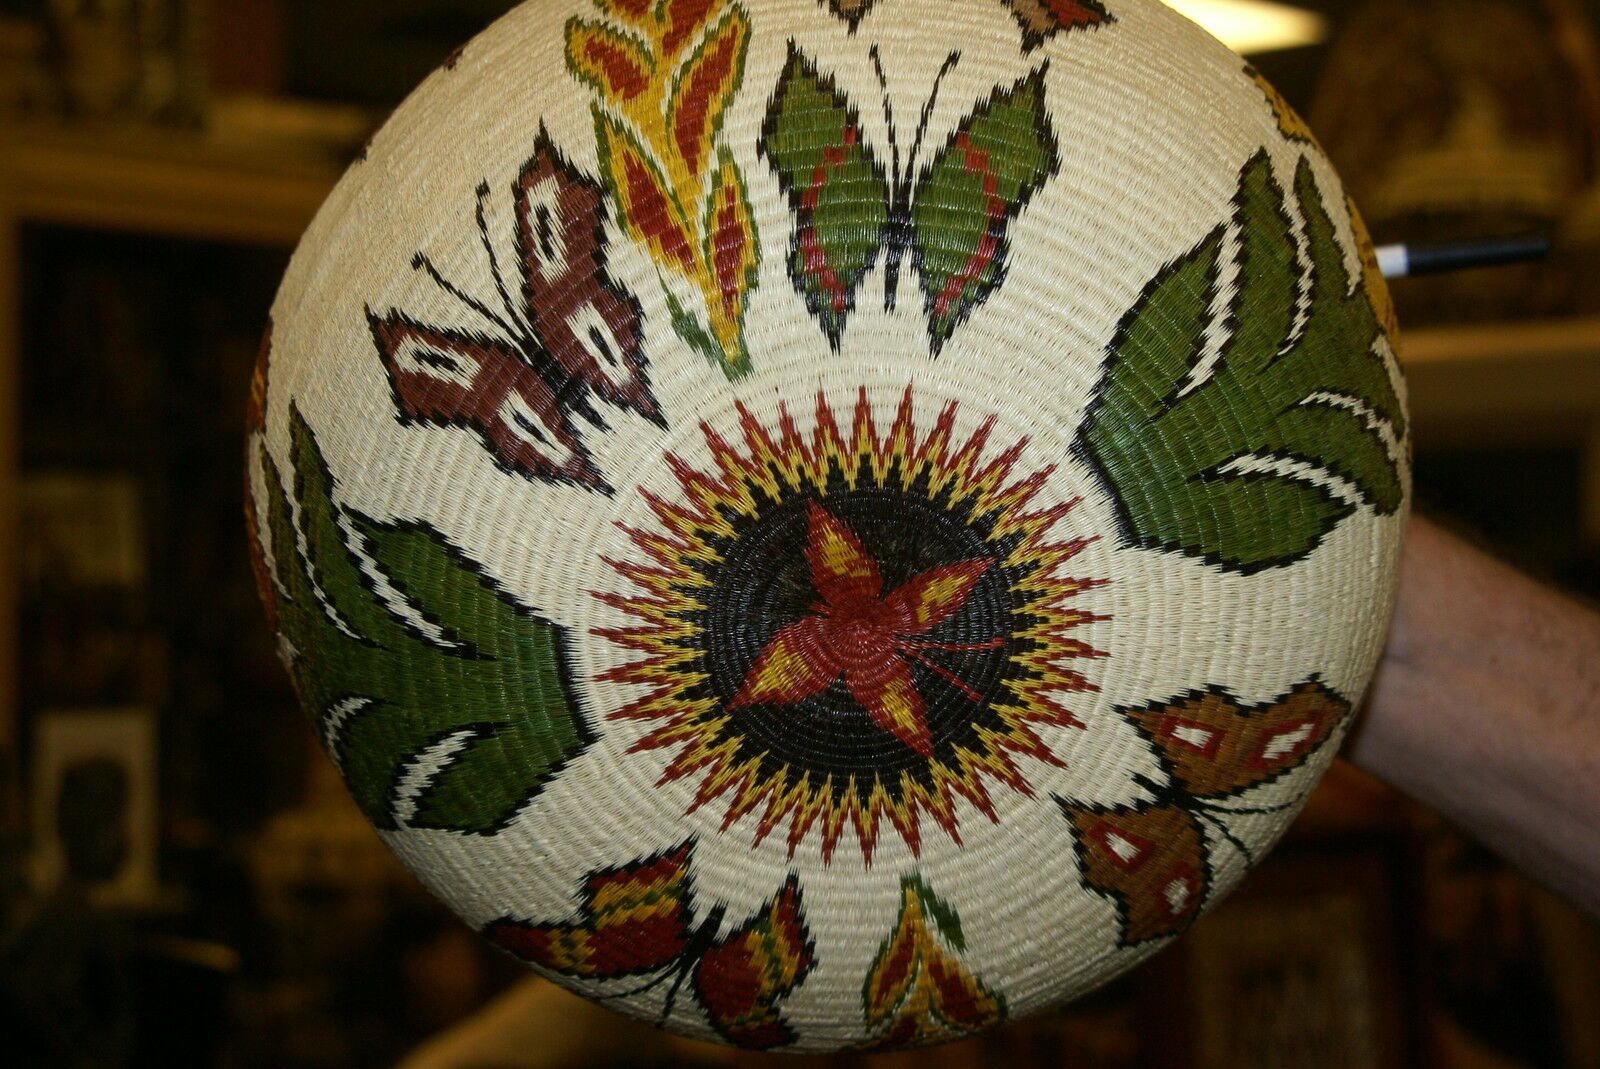 Museum Wounaan Indian Hosig Di Masterpiece Artist Basket Orchid Flowers 300A29 -